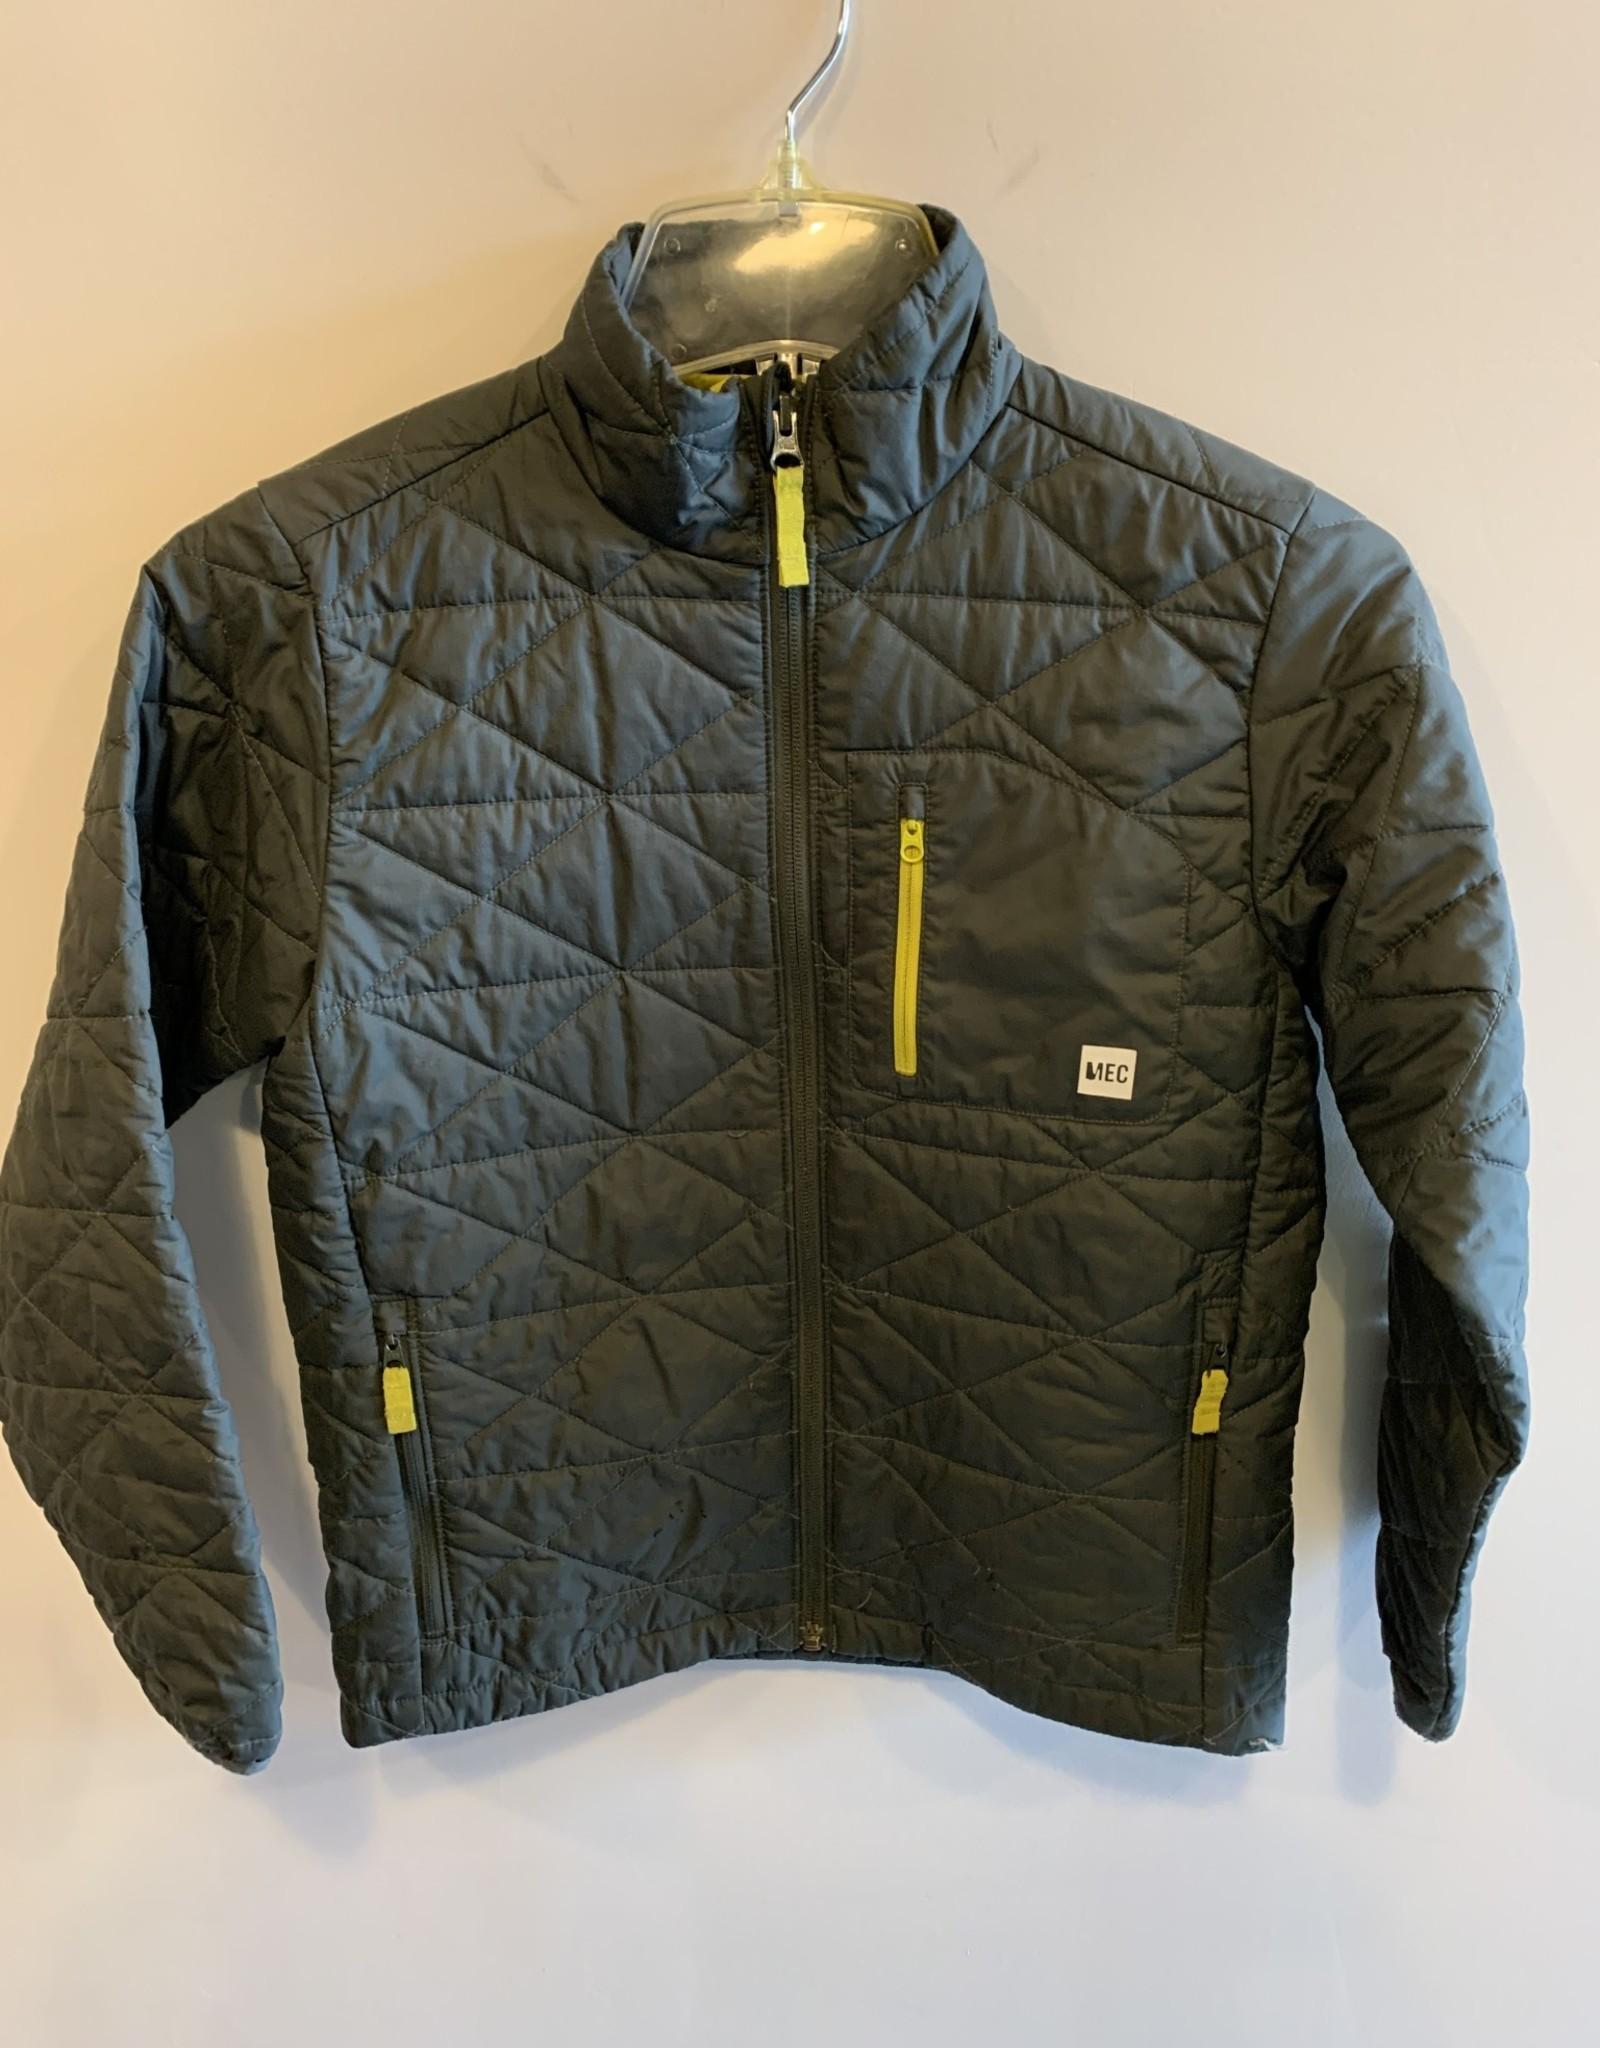 Mountain Equipment Co-op Boys/8/MEC/Jacket (as is)